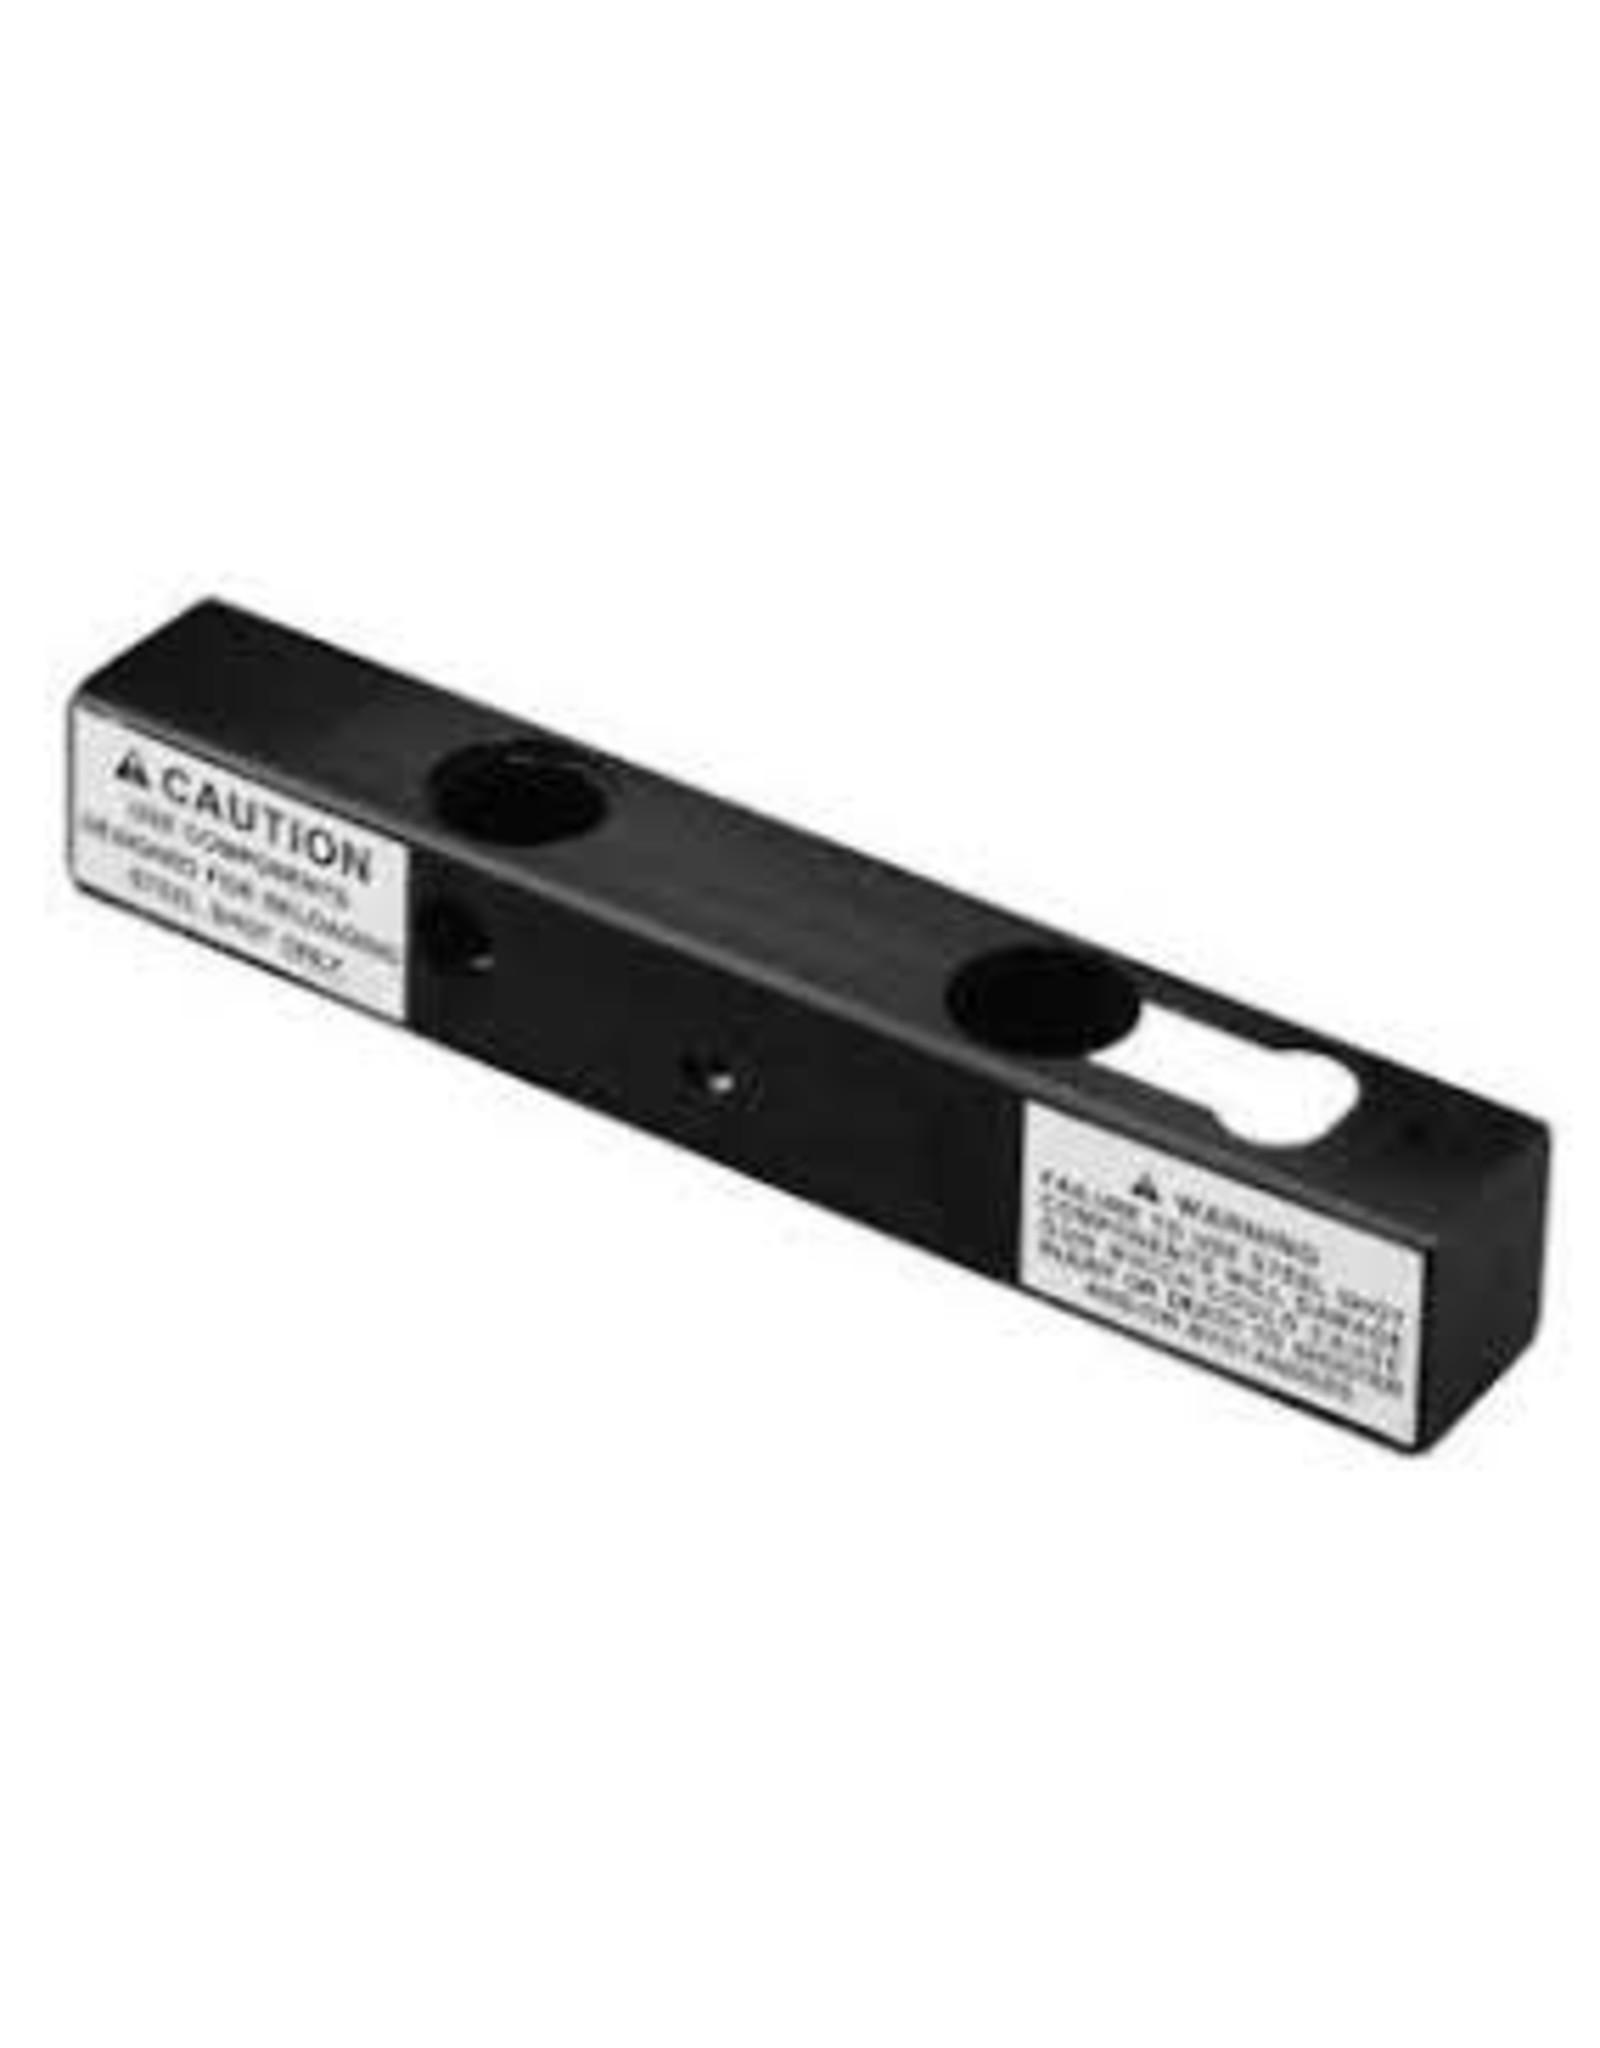 MEC MEC Steel Shot 302 Charge Bar 1-1/4 OZ BB - #2